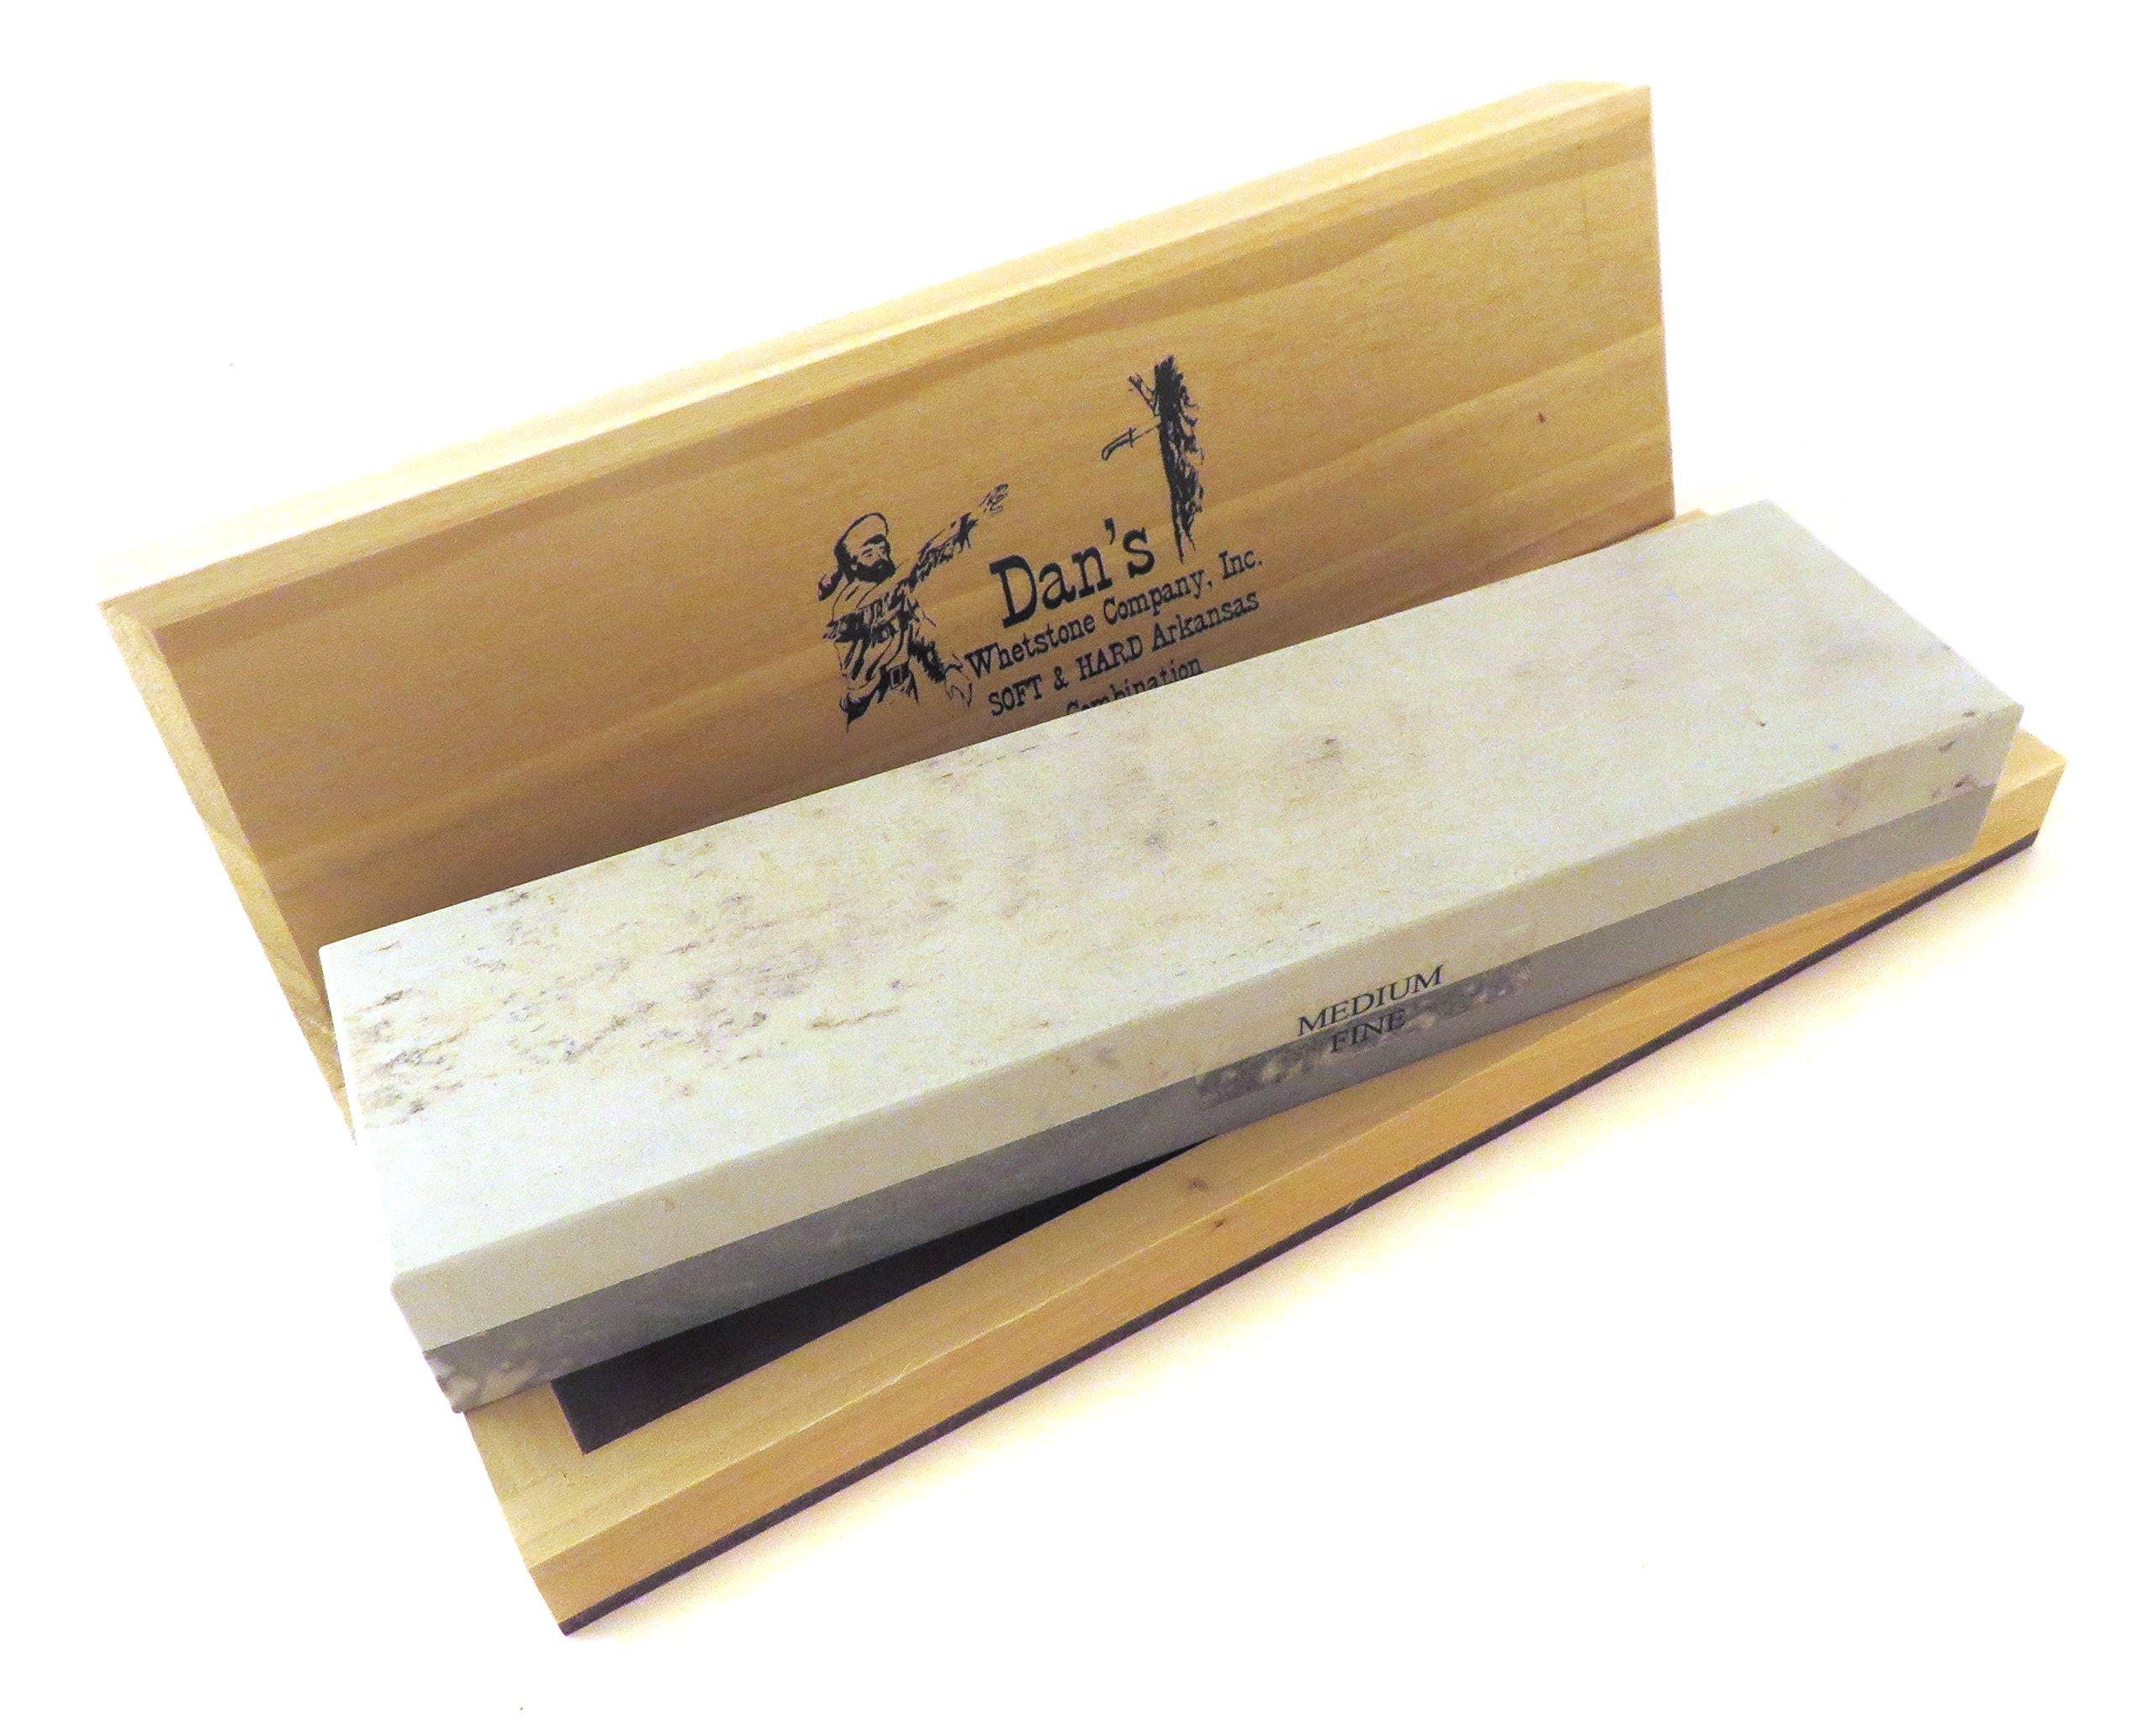 Genuine Arkansas Combination Soft (Medium) and Hard (Fine) Knife Sharpening Bench Stone Whetstone 8'' x 2'' x 1'' in Wood Box MFC-8-C